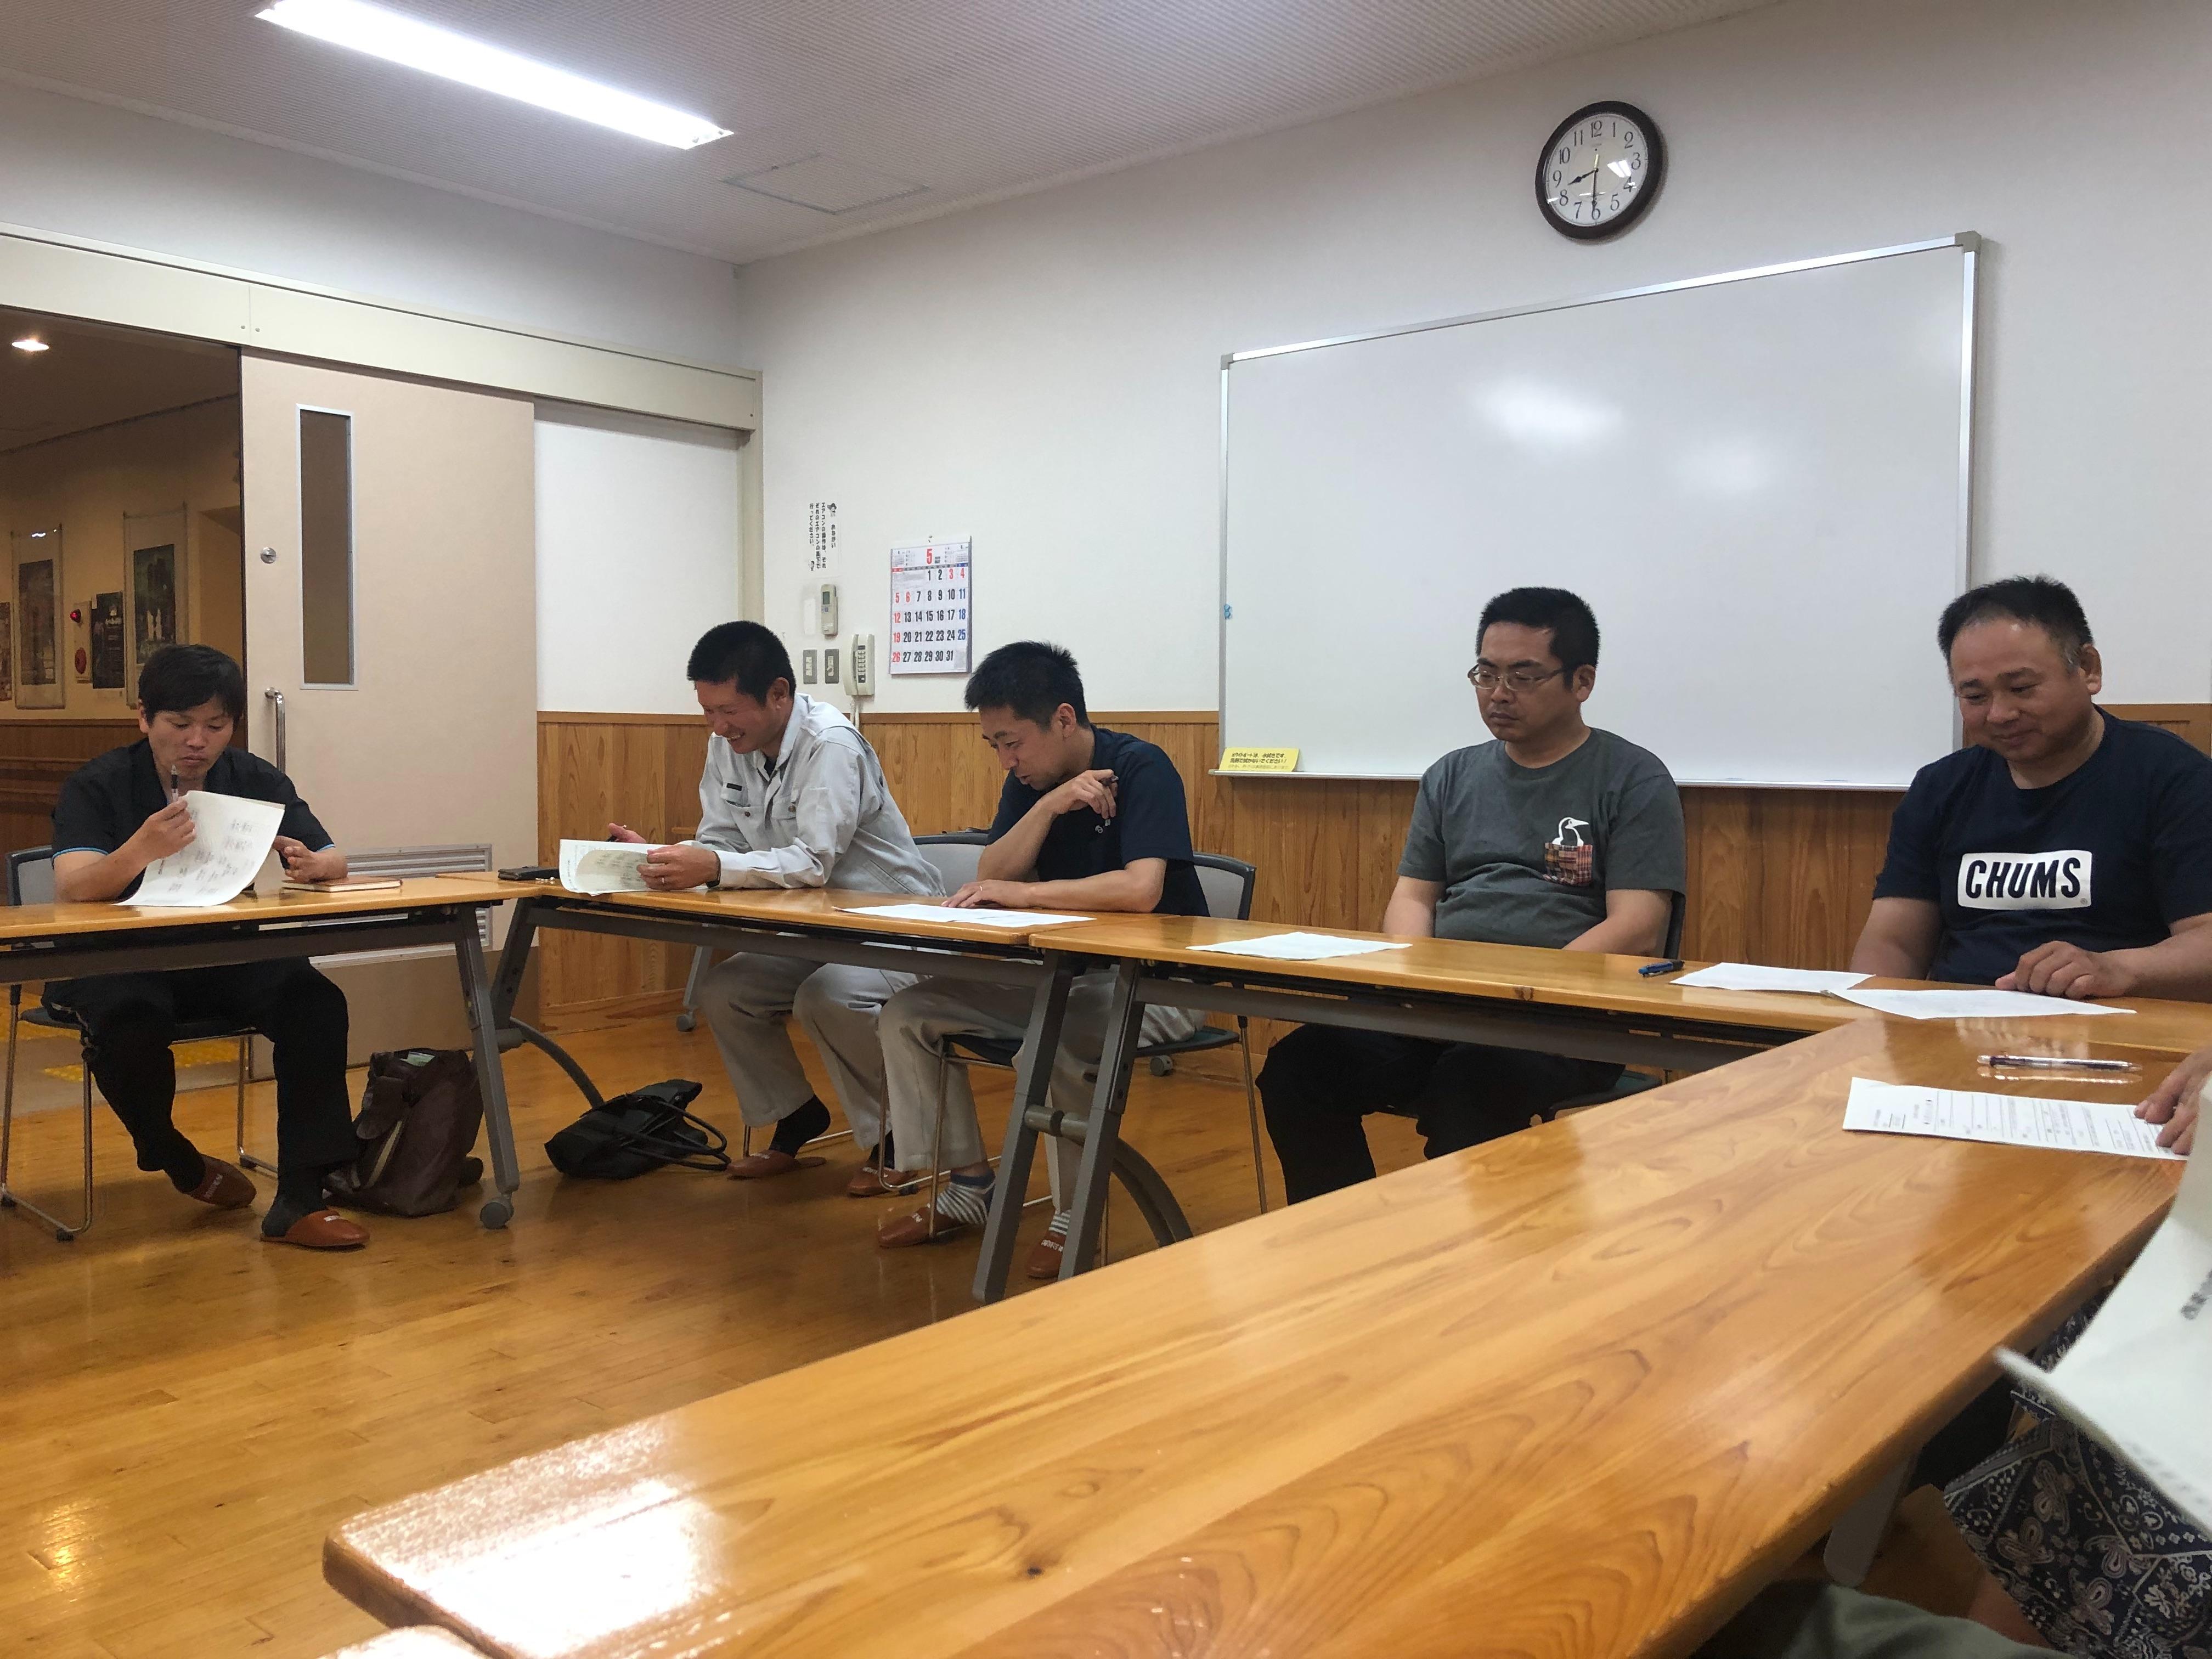 f:id:masanori-kato1972:20190517194511j:image